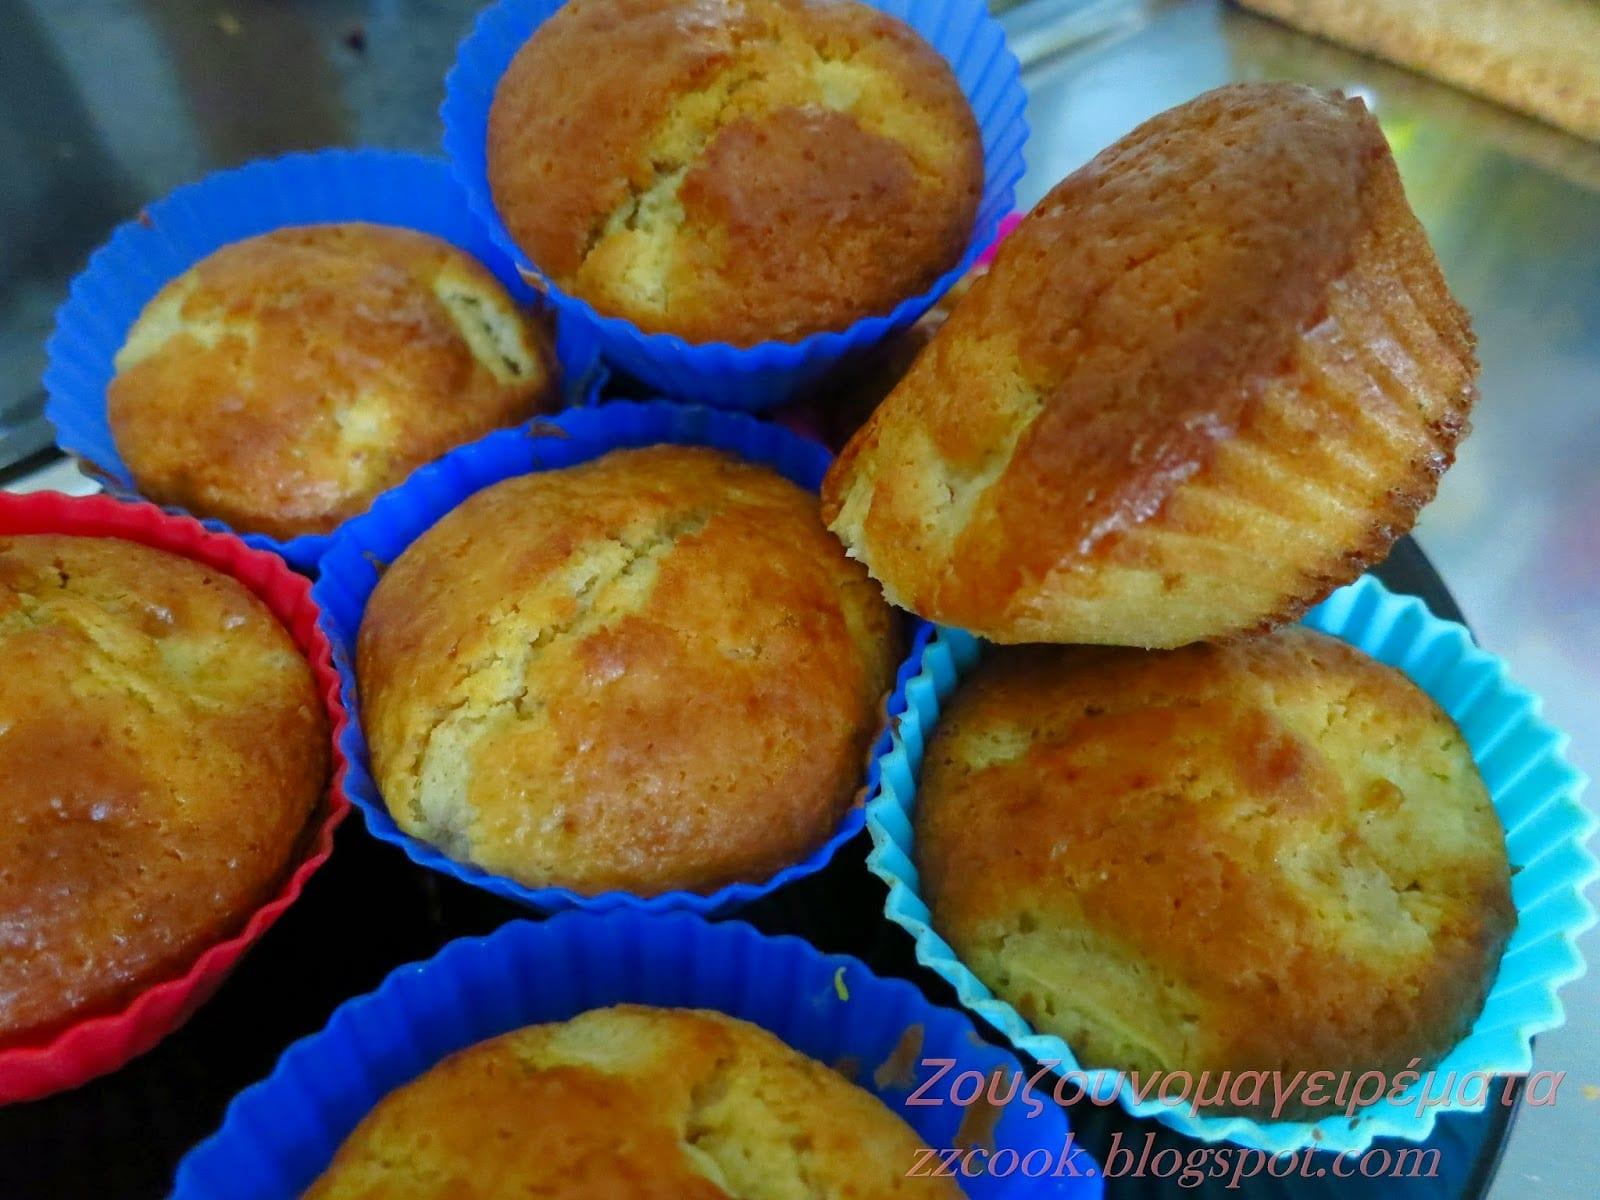 Muffins μήλου εύκολα χωρίς μίξερ για όλες τις ώρες!